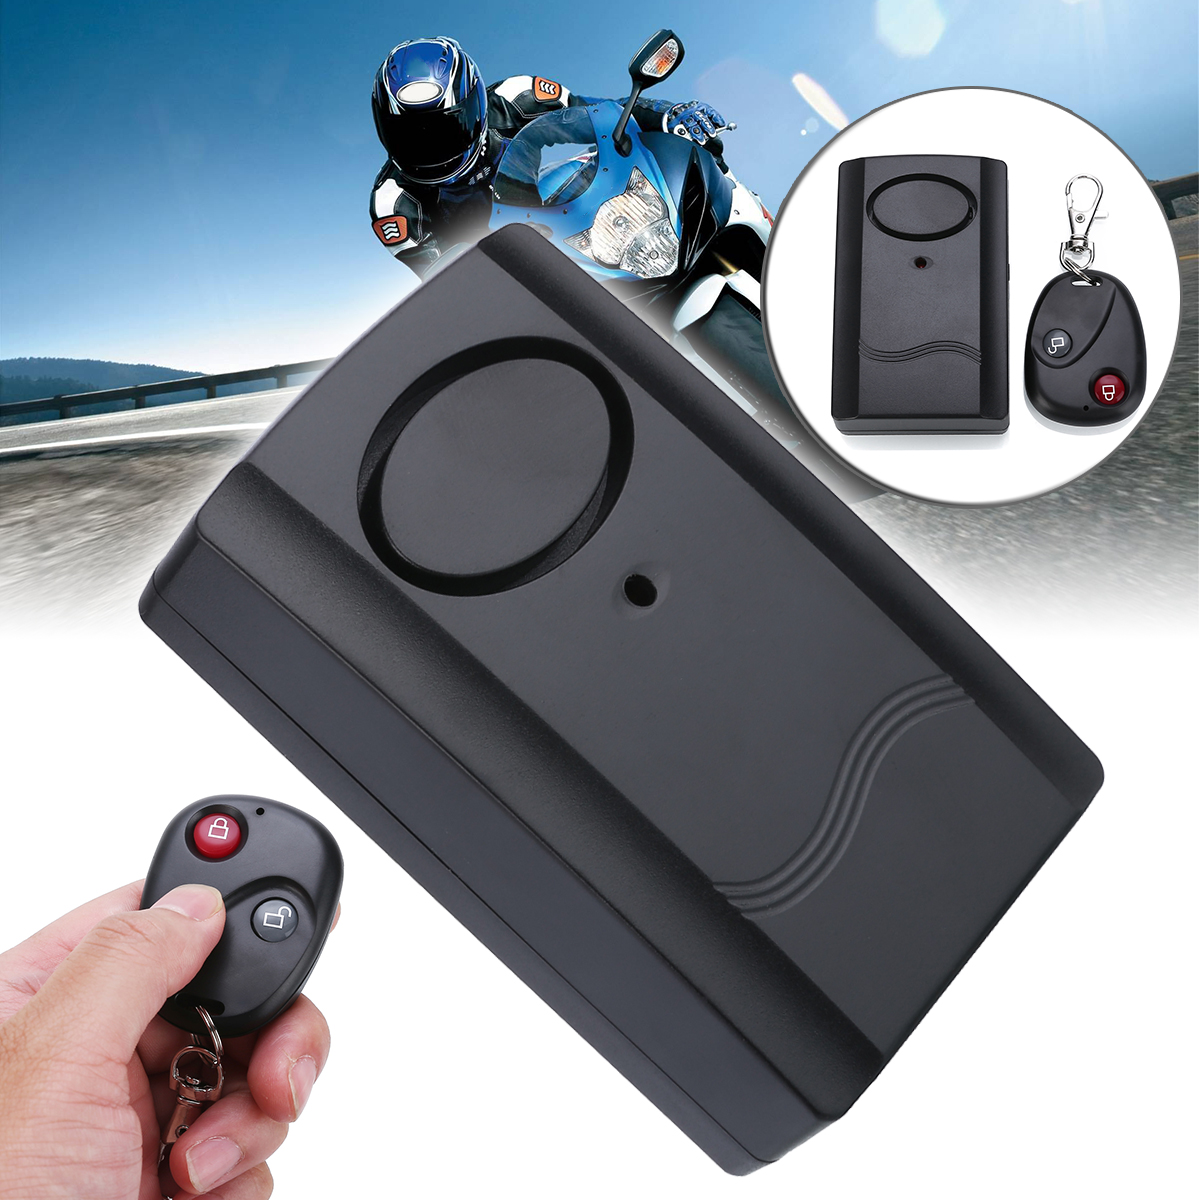 1set Motorcycle Security Alarm Lock Motorbike Anti-theft Security Safety Automotive Moto Alarm Remote System Protection